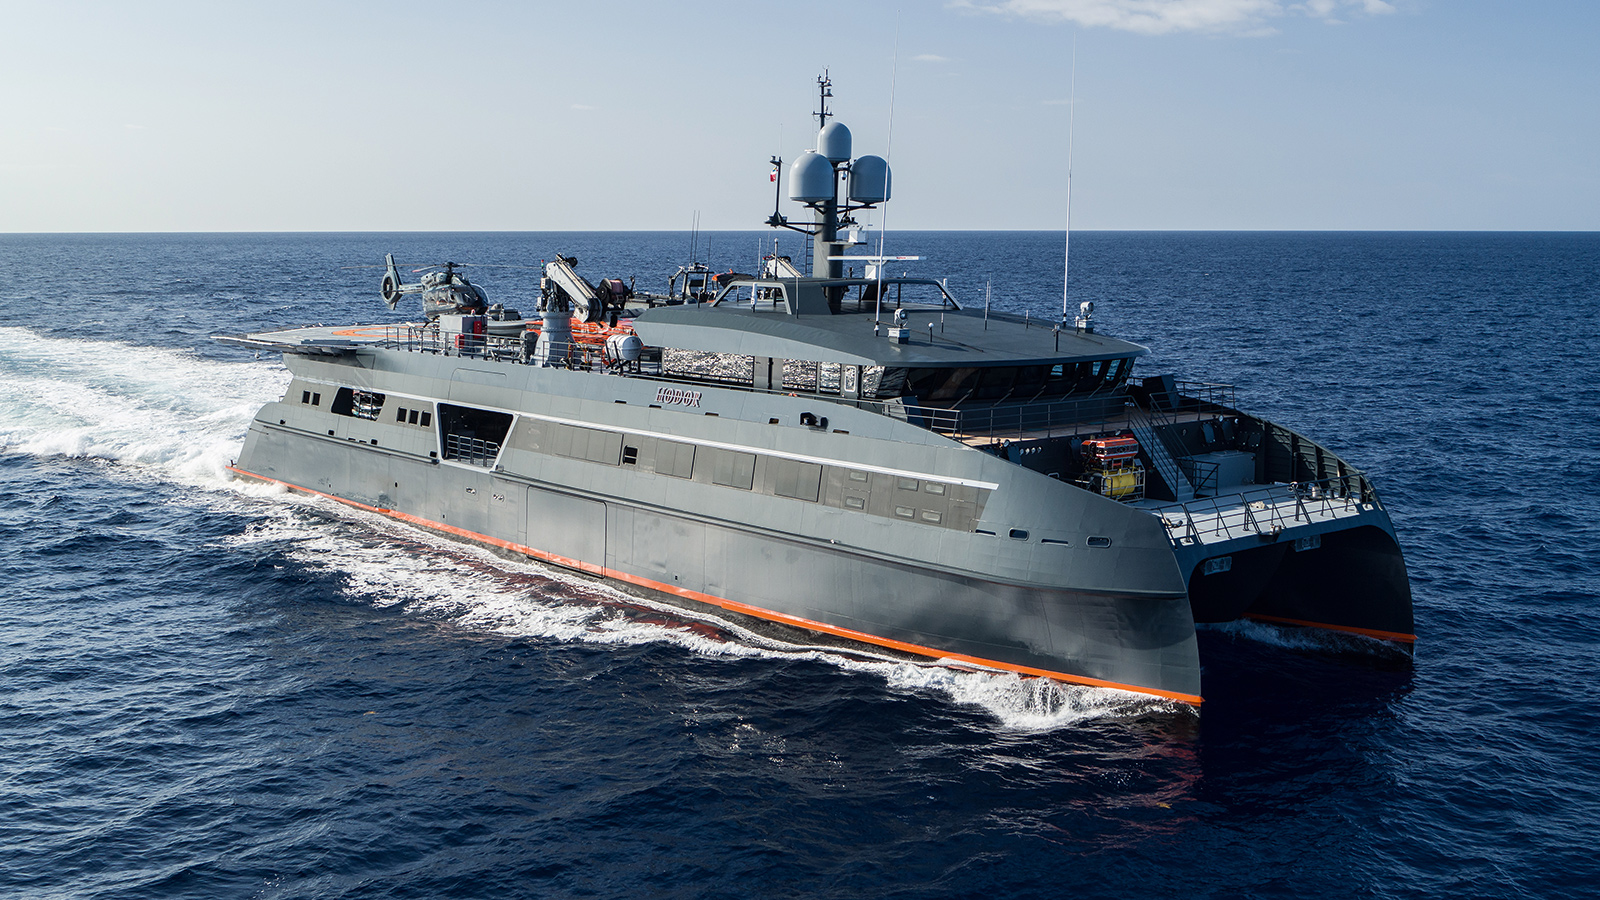 Catamaran-superyachet-Hodor-worlds-largest-toybox